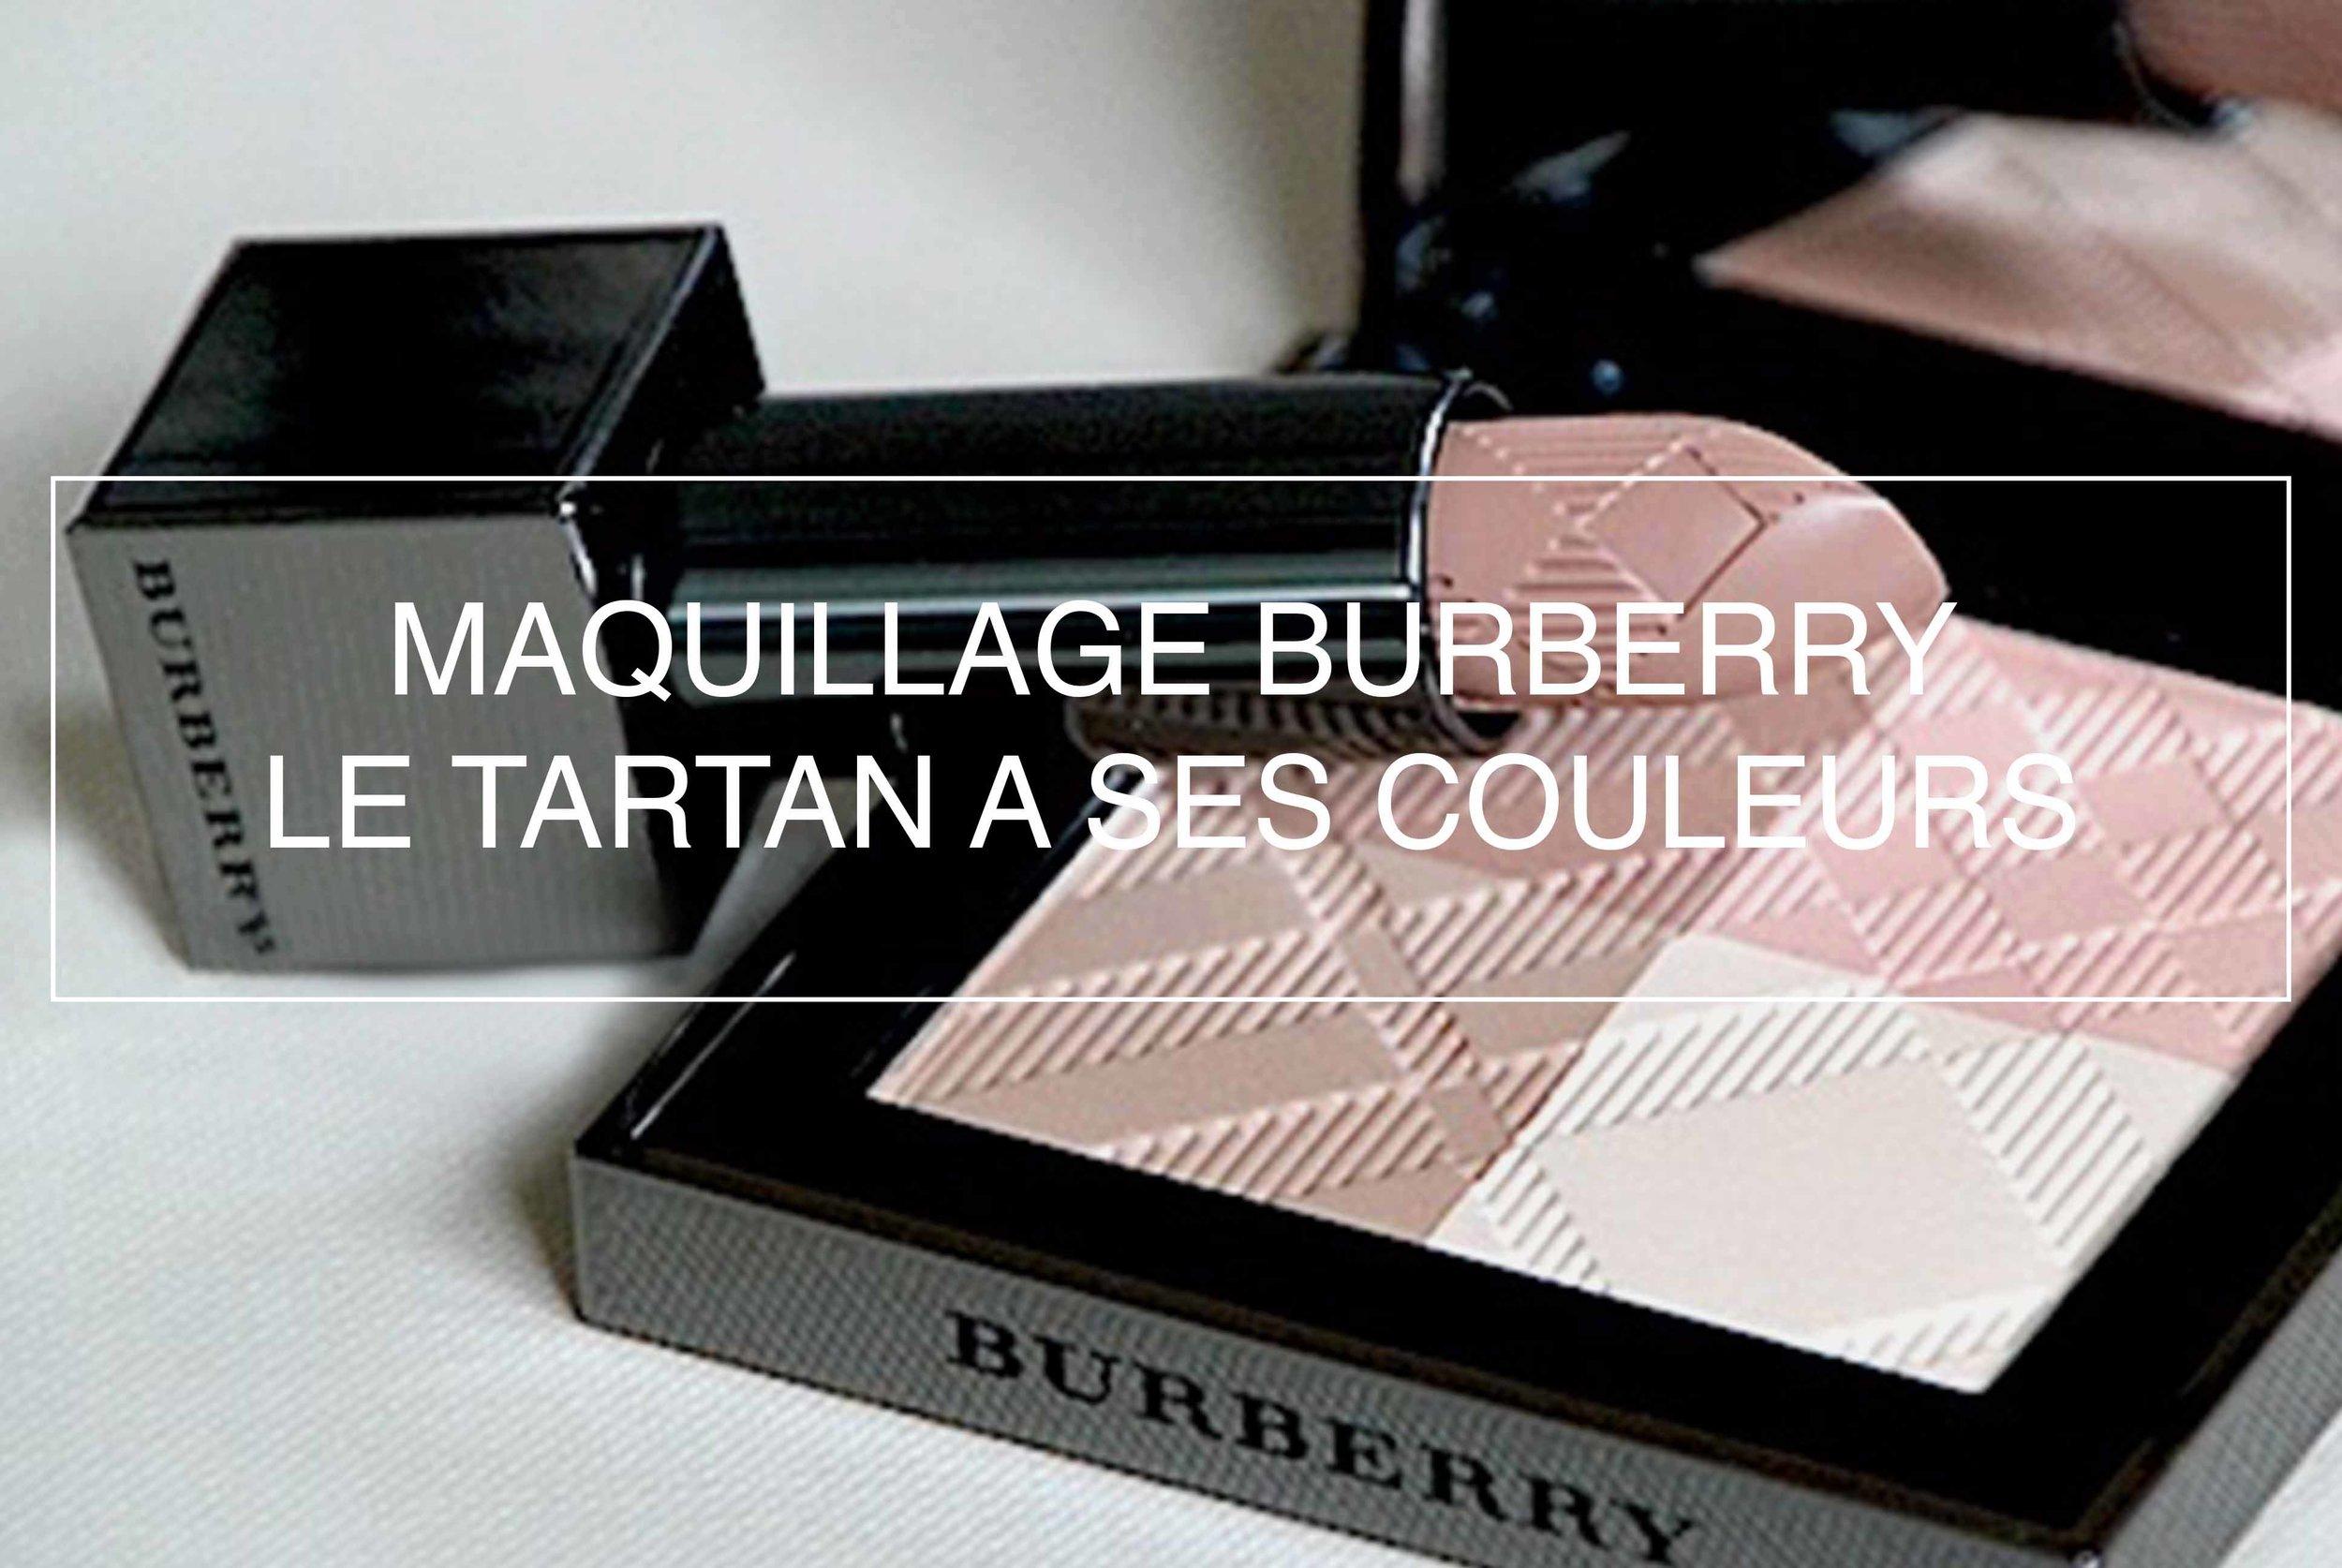 INTRO MARQUE SITE DB BURBERRY-FR.jpg